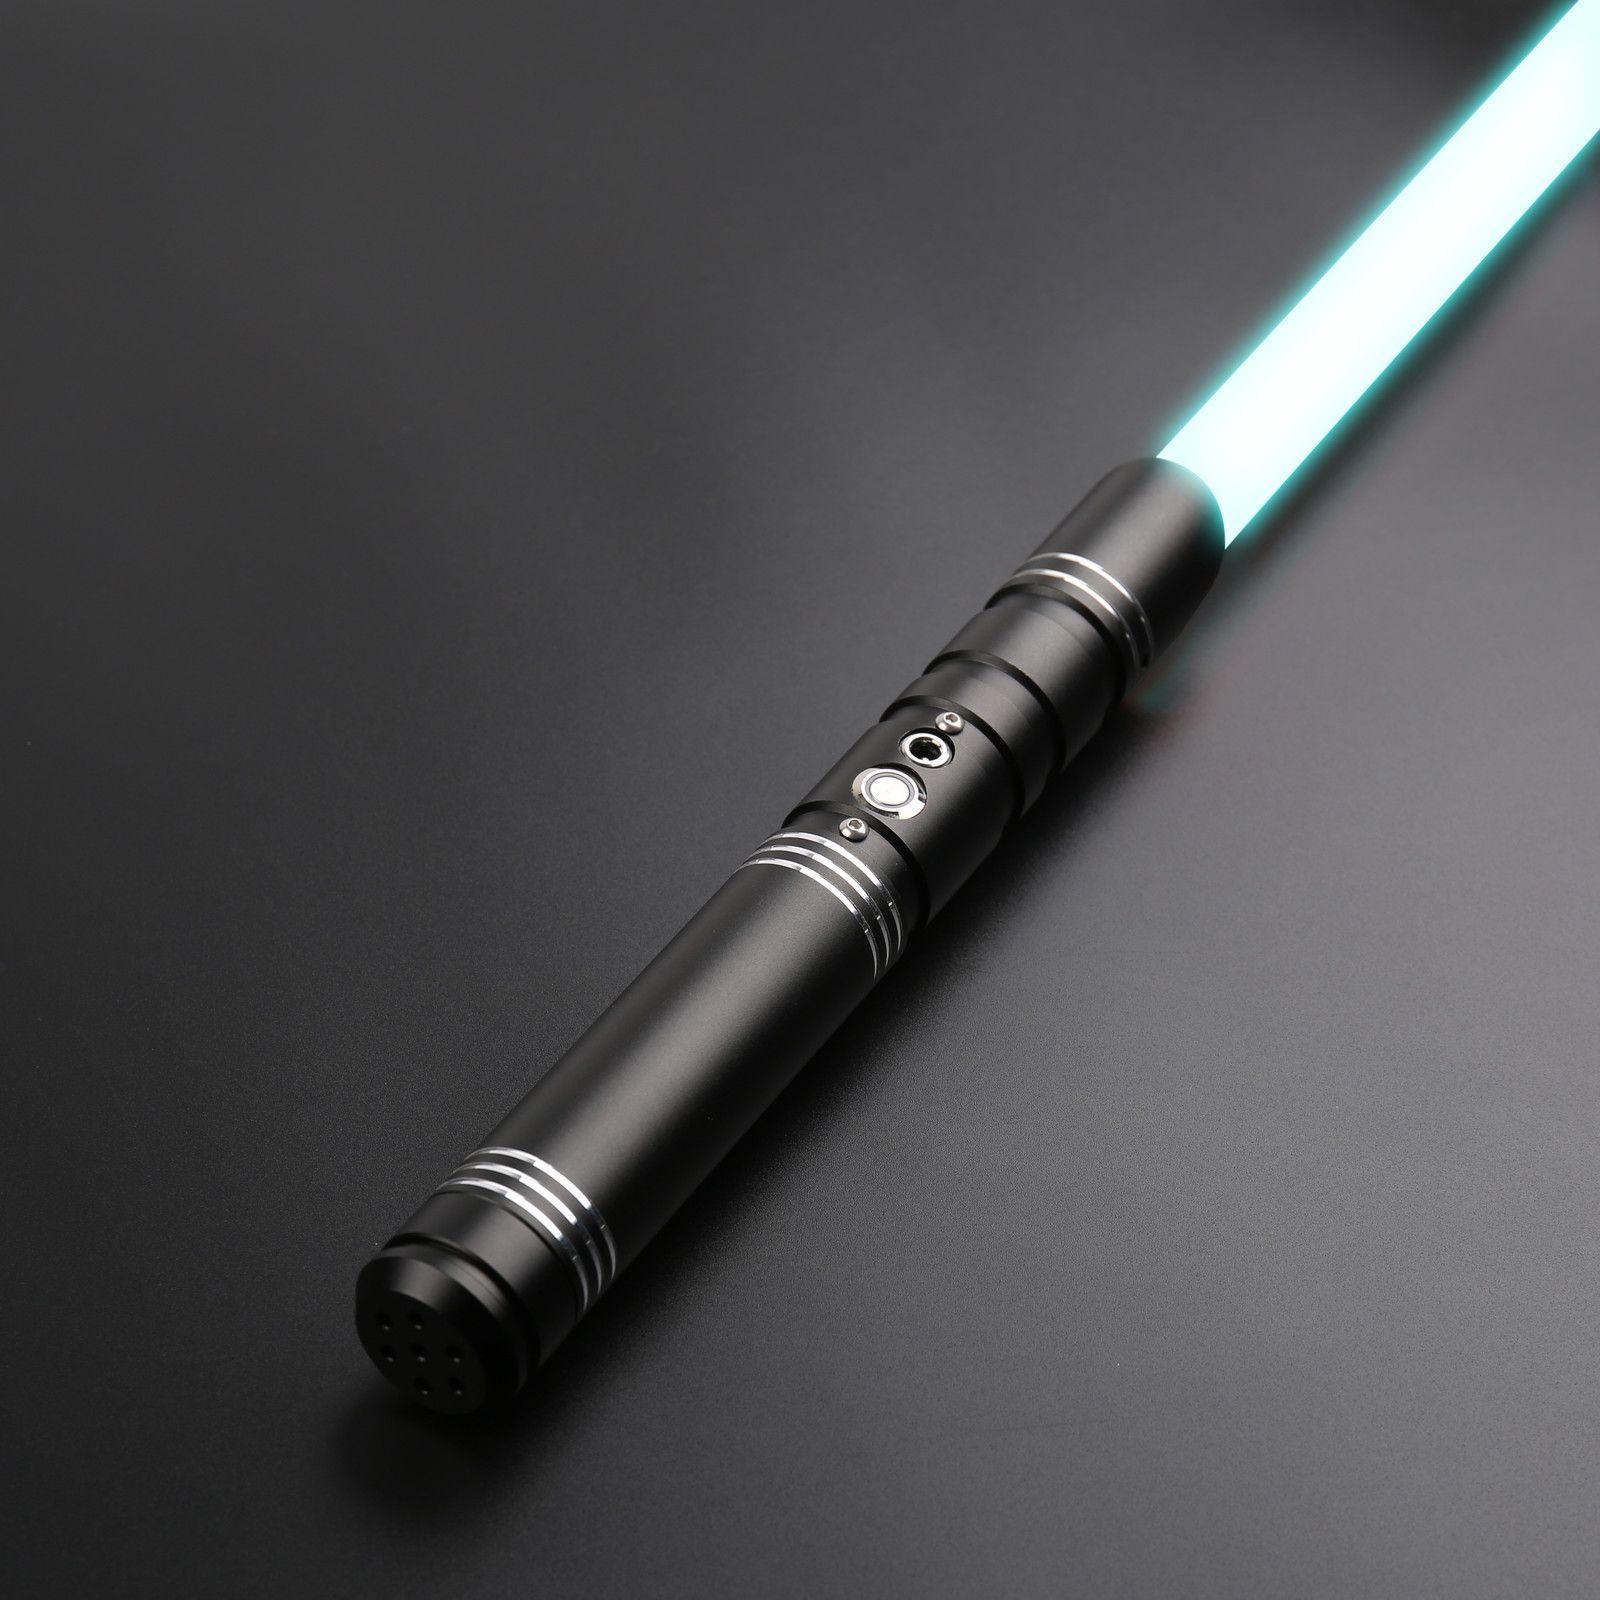 TXQSaber RGB Lightsaber Metal Kolu Blaster Foc Kilitleme Ses Ayarı 12 Renk Değişim 6 Soundfonts Sabers Ağır Dueling Q0113